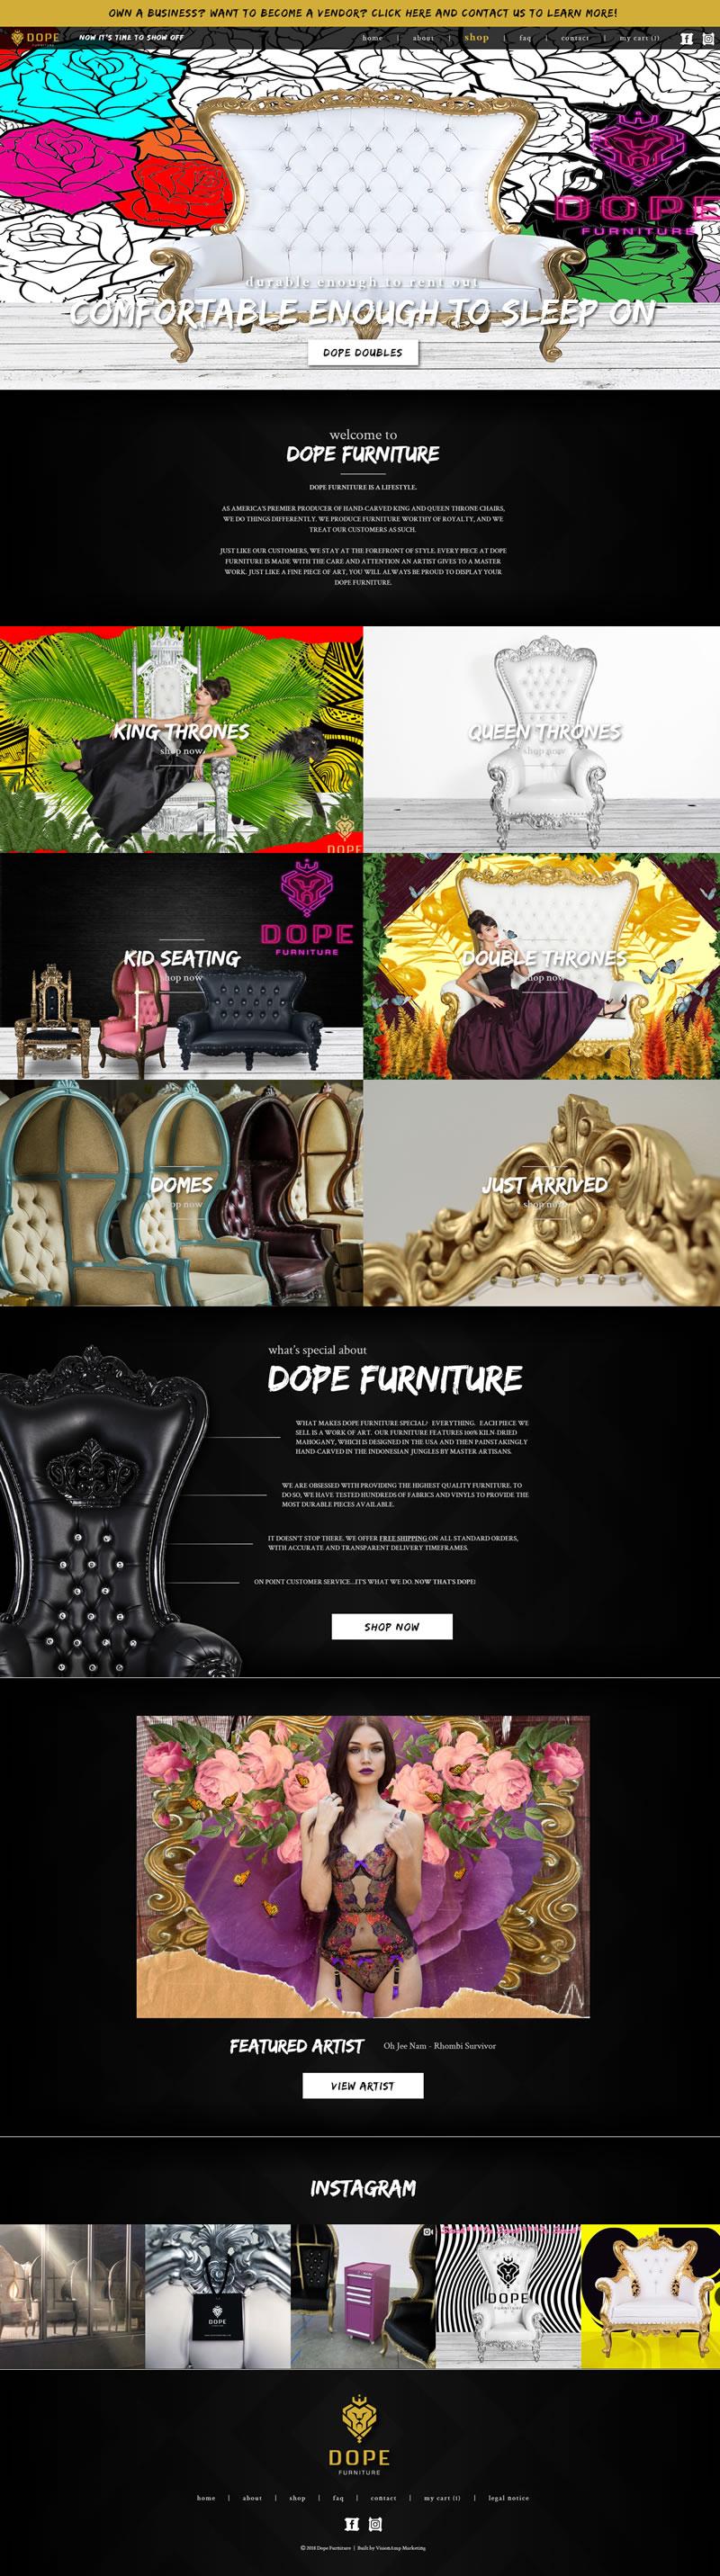 Dope Furniture Full Web Design Image